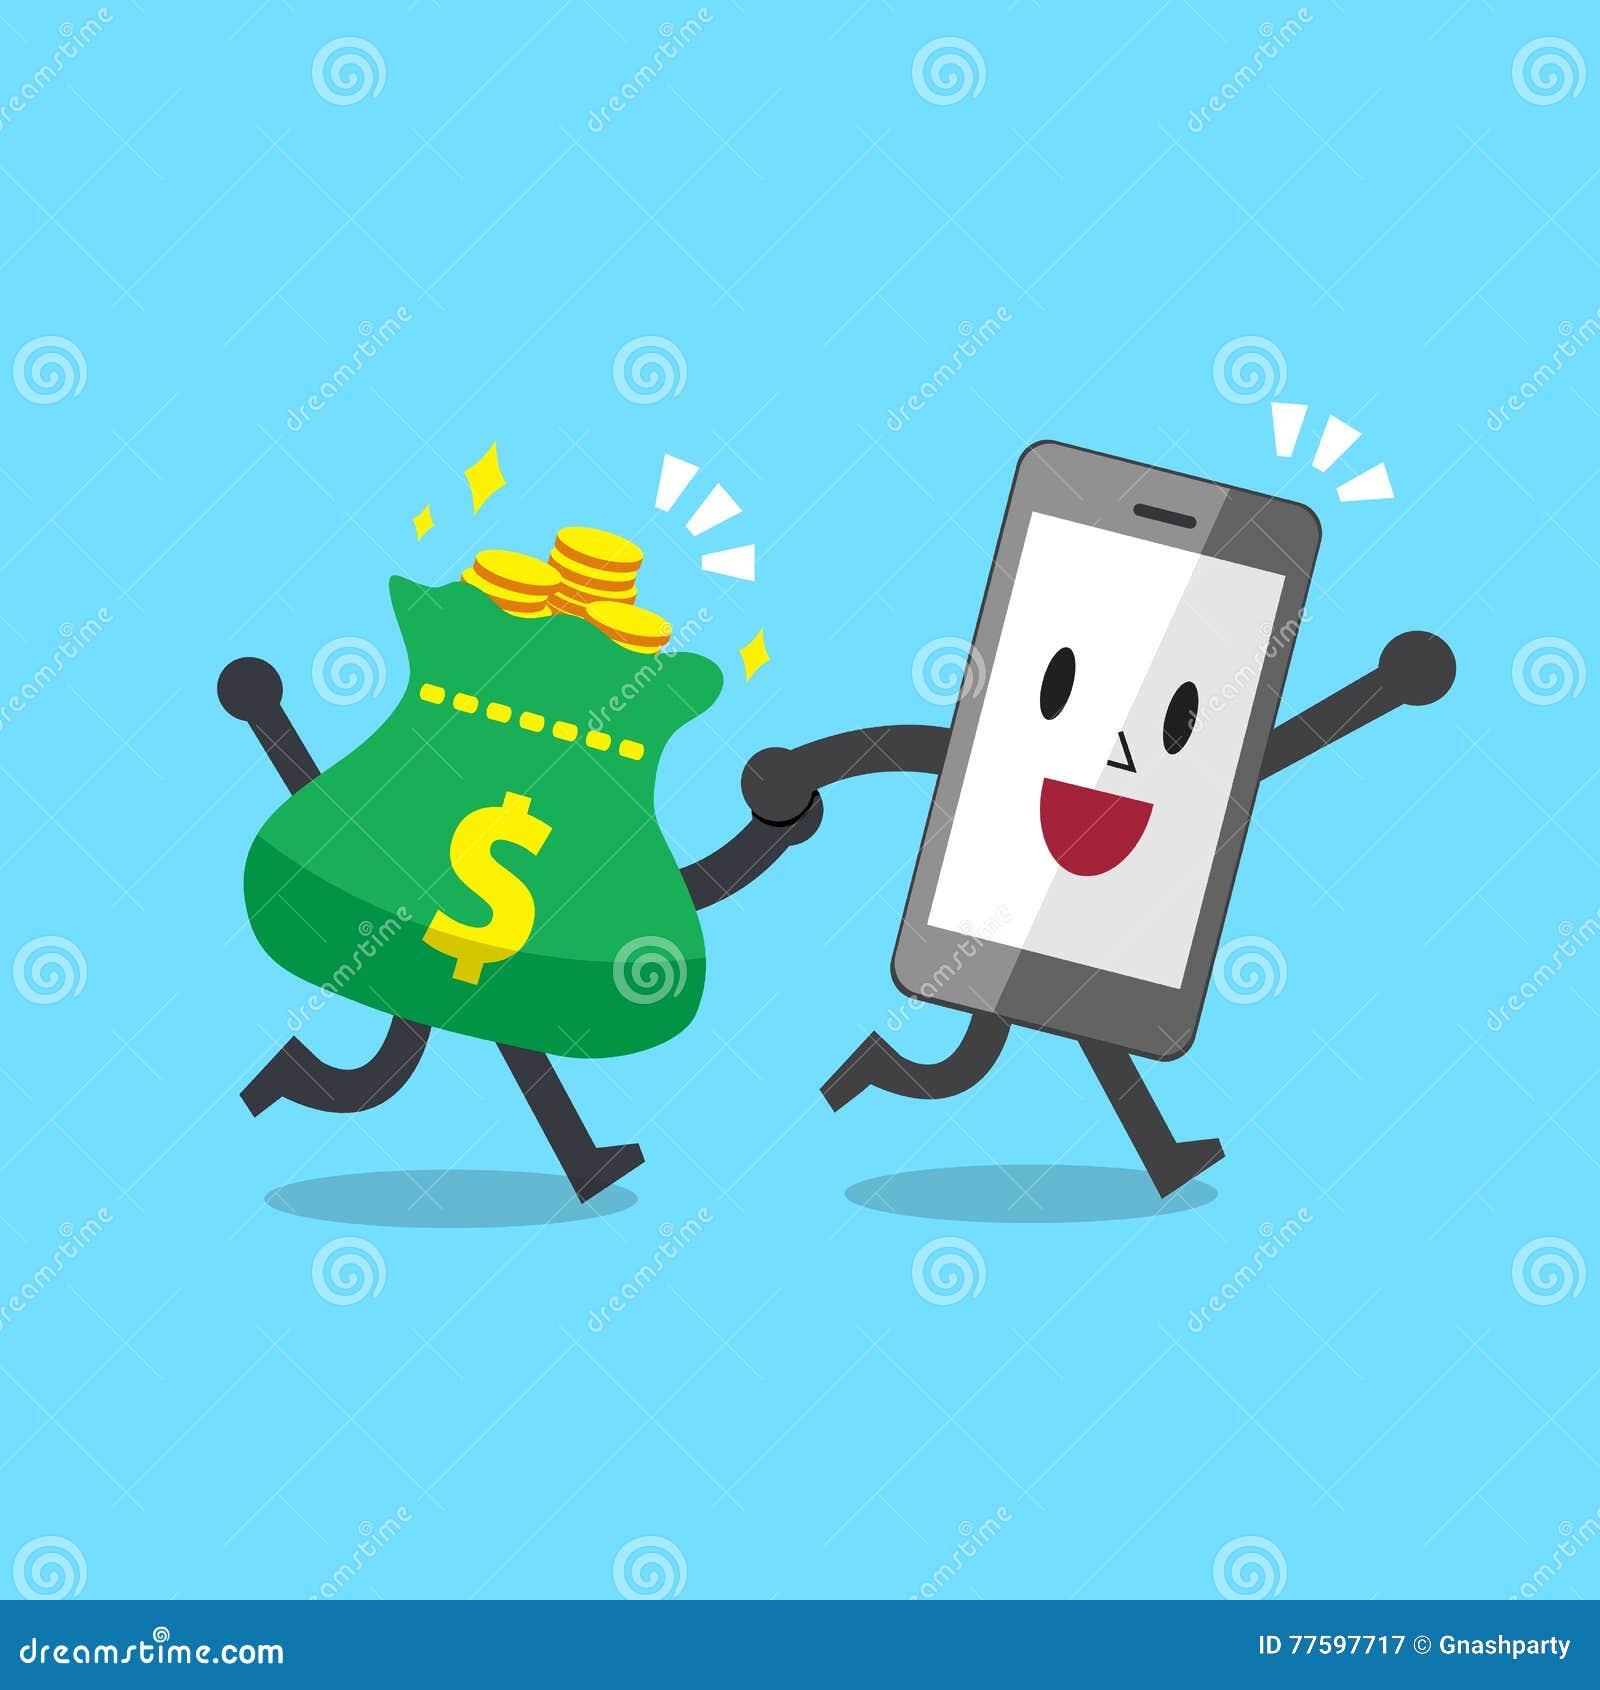 Cartoonsmart Character Design : Cartoon character smartphone with money bag stock vector